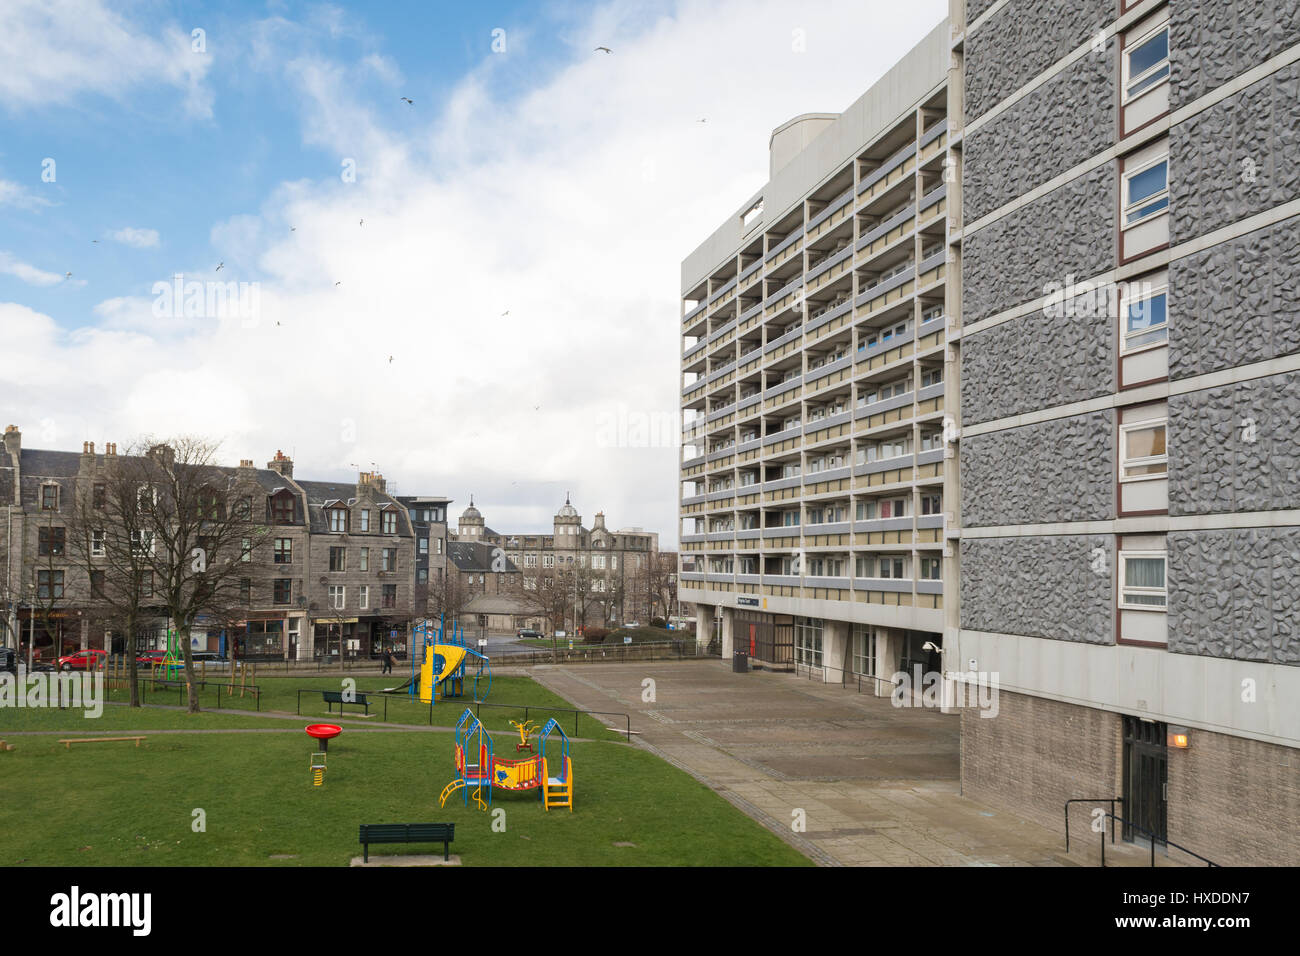 Aberdeen Council high rise multi storey flats buildings play area Virginia Court, Aberdeen, Scotland, UK - Stock Image